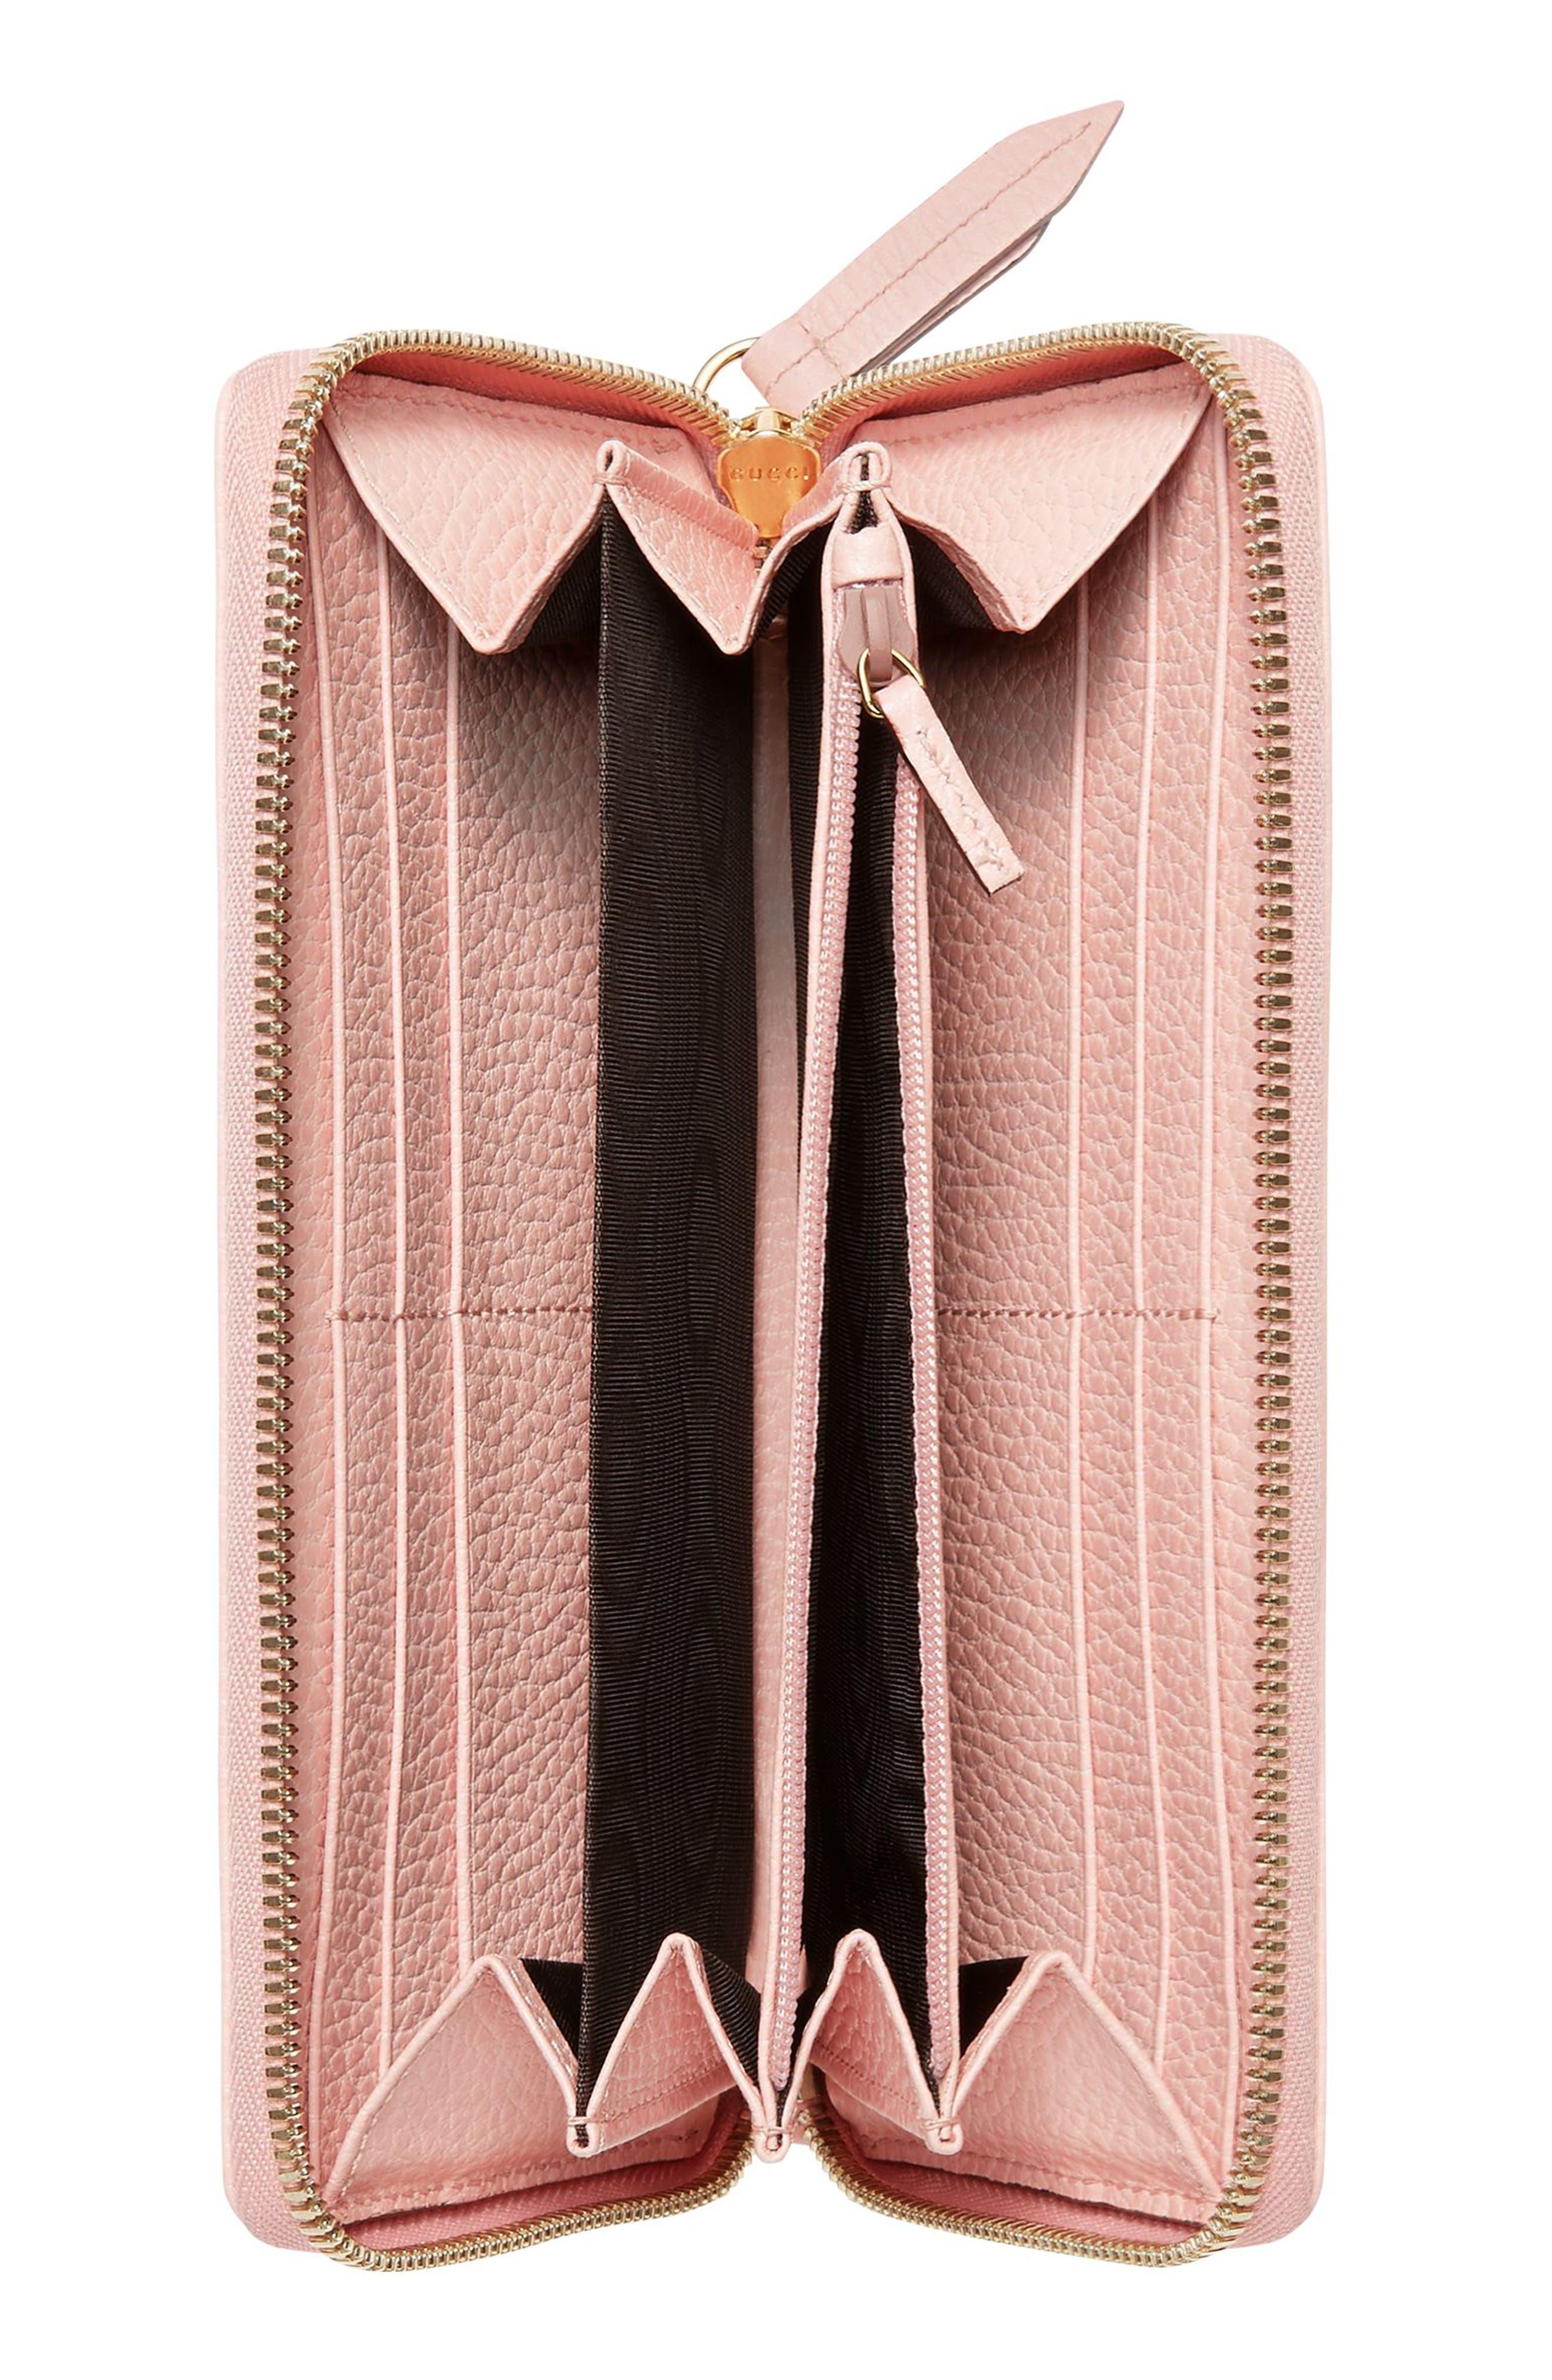 Petite Marmont Leather Zip Around Wallet,                             Alternate thumbnail 2, color,                             650